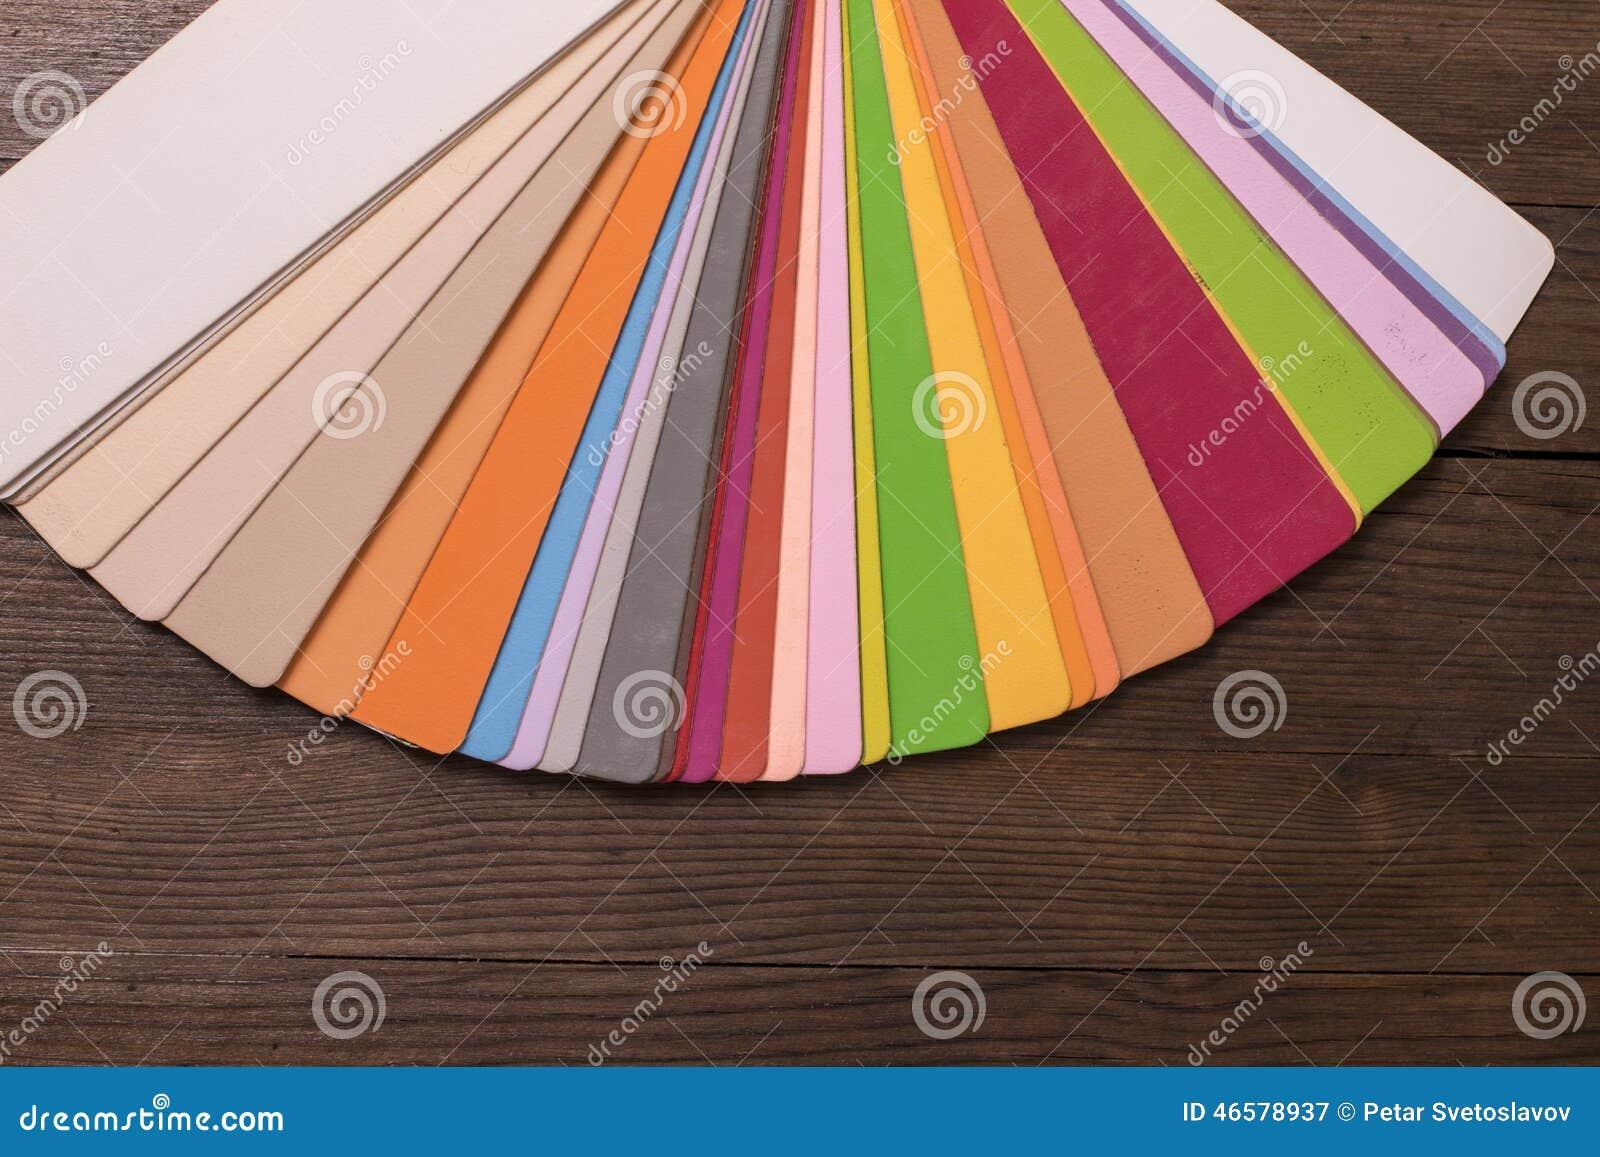 color catalogue on wooden desk stock photo image 46578937. Black Bedroom Furniture Sets. Home Design Ideas